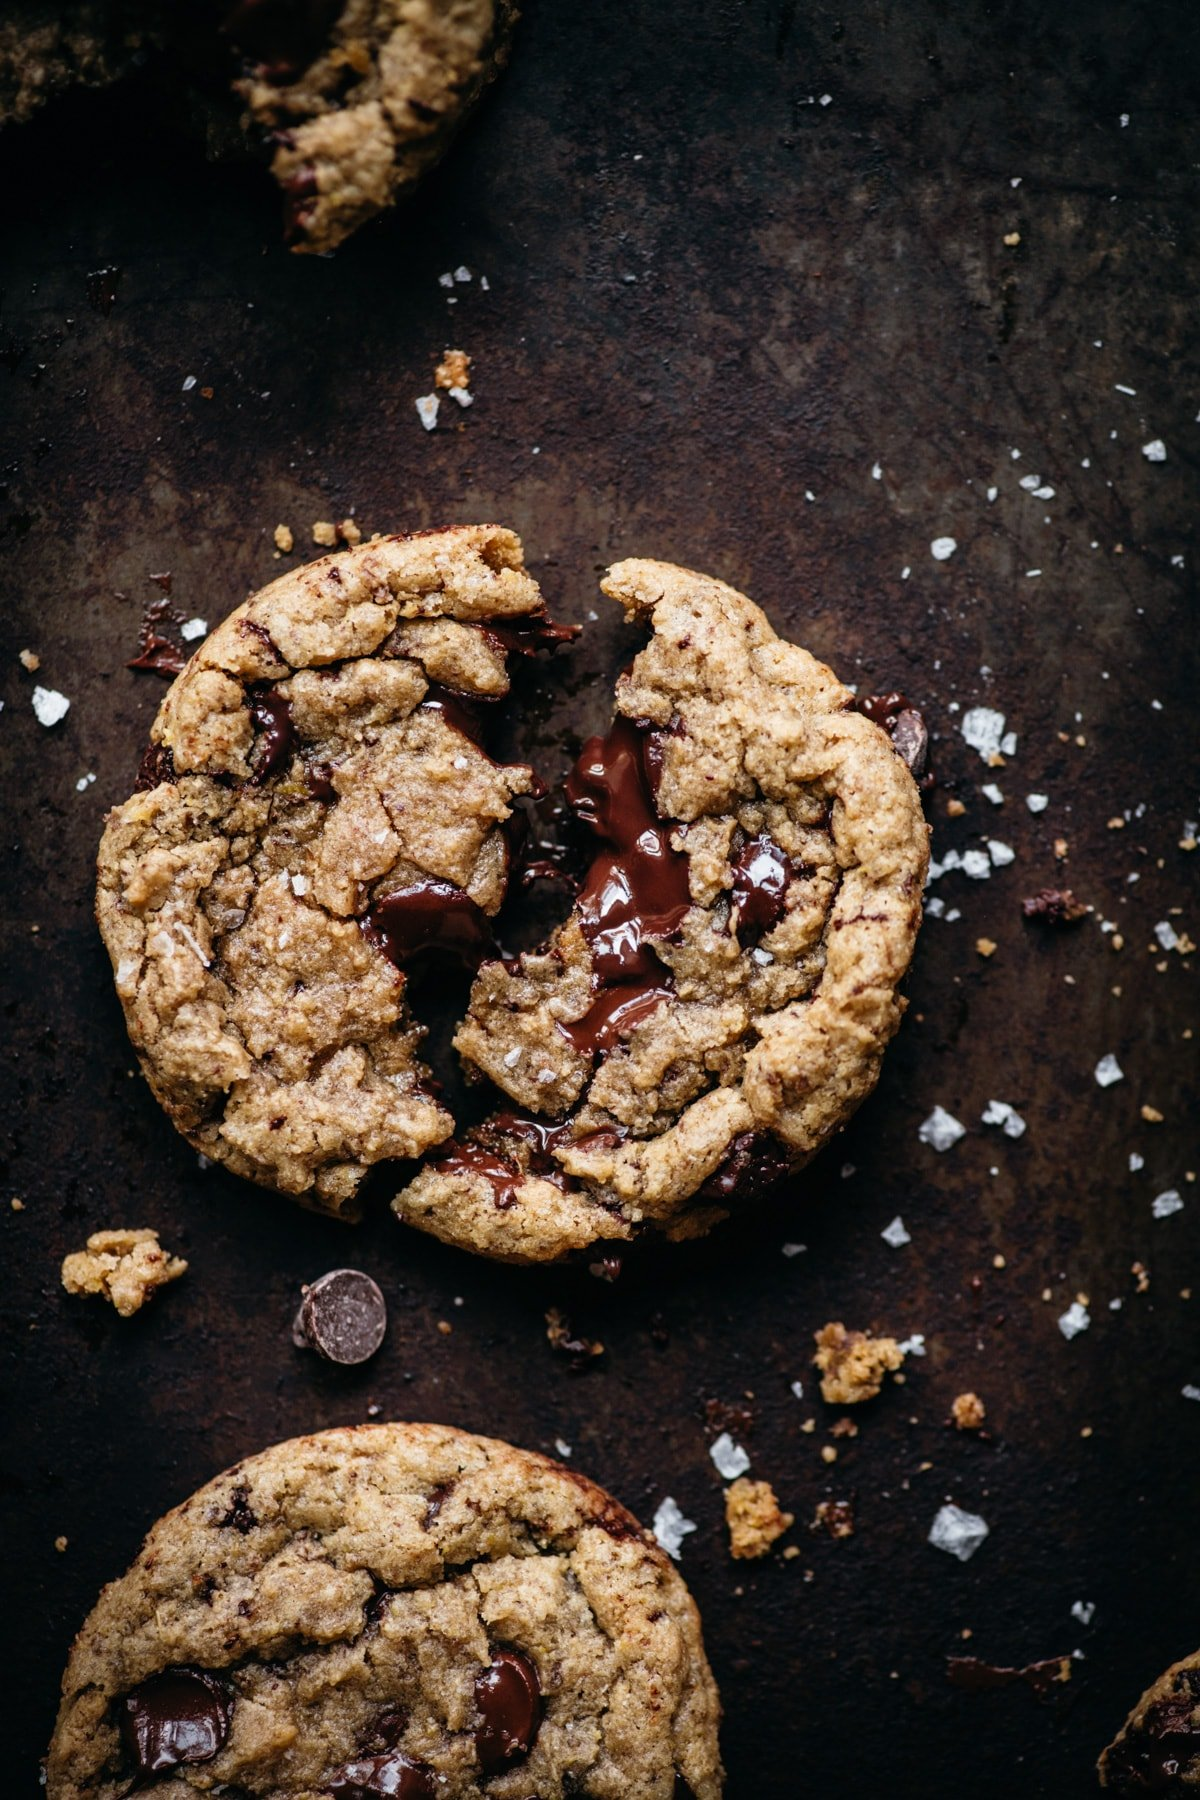 close up overhead view of melty vegan chocolate chip cookie broken in half on rustic sheet pan.